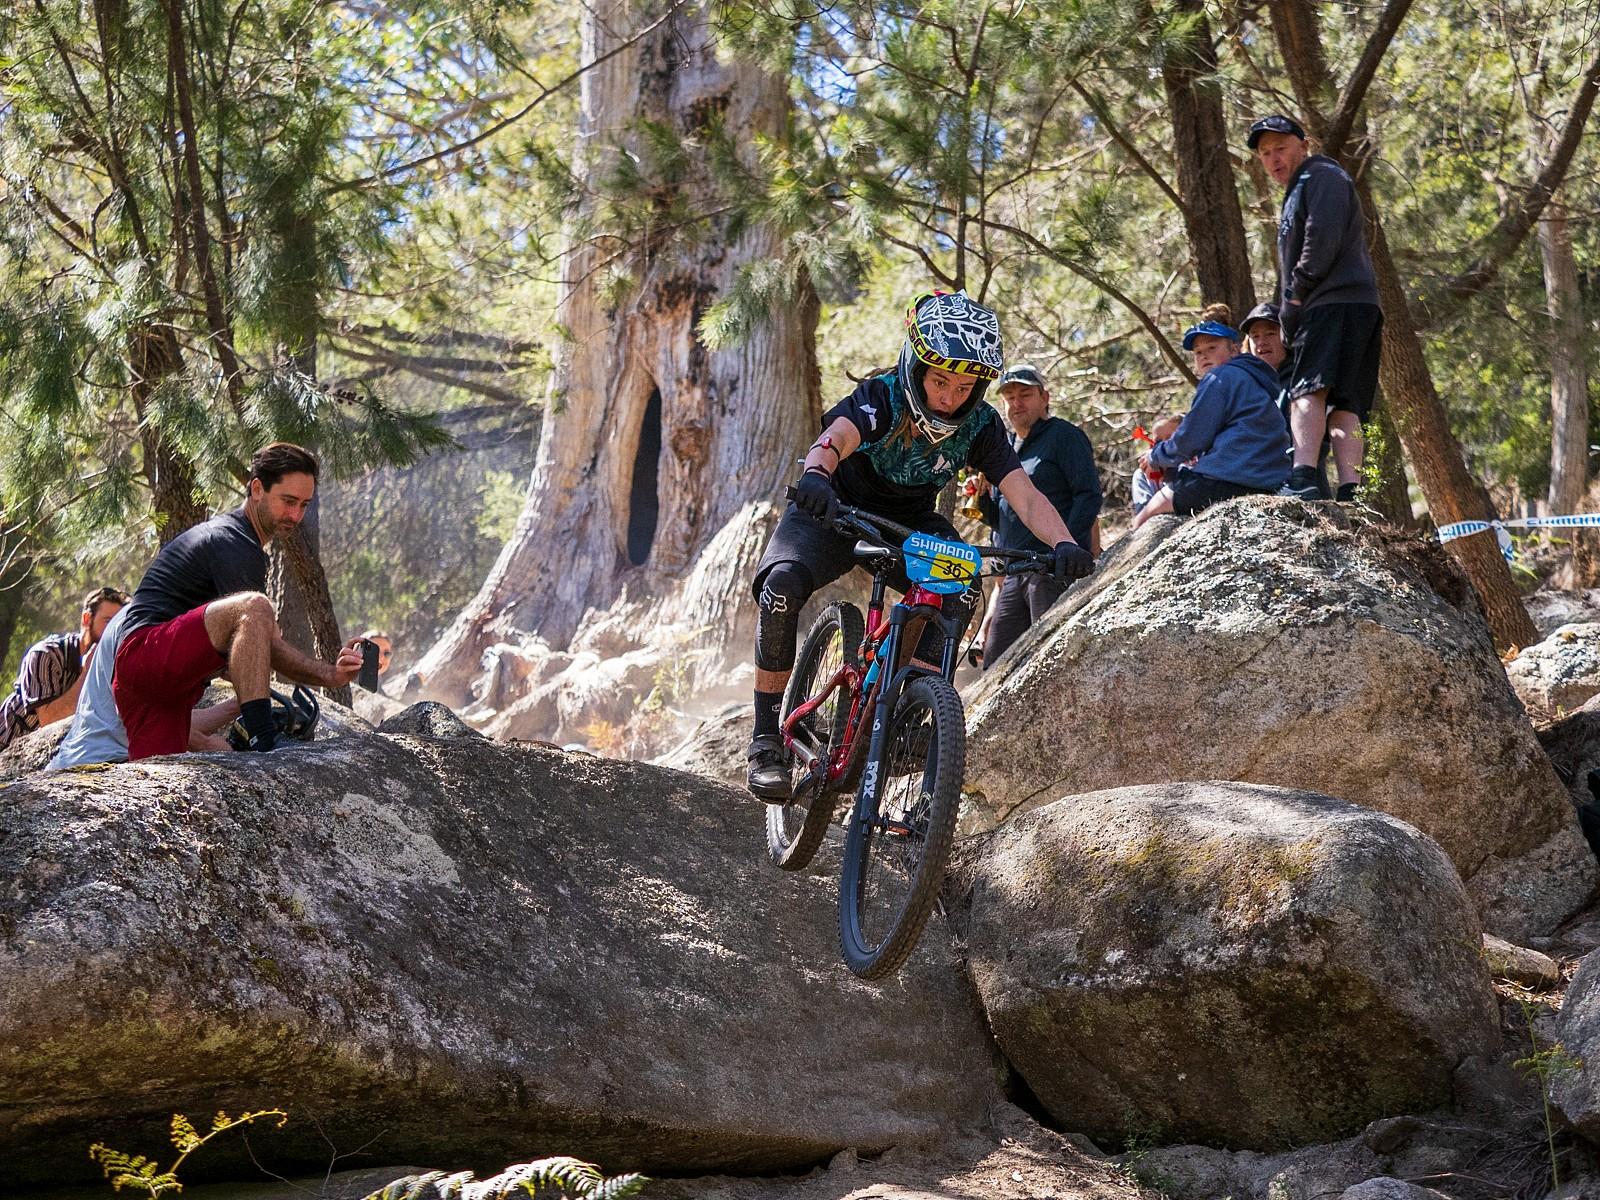 171119-Tassie-0928 - jack.fletcher86 - Mountain Biking Pictures - Vital MTB